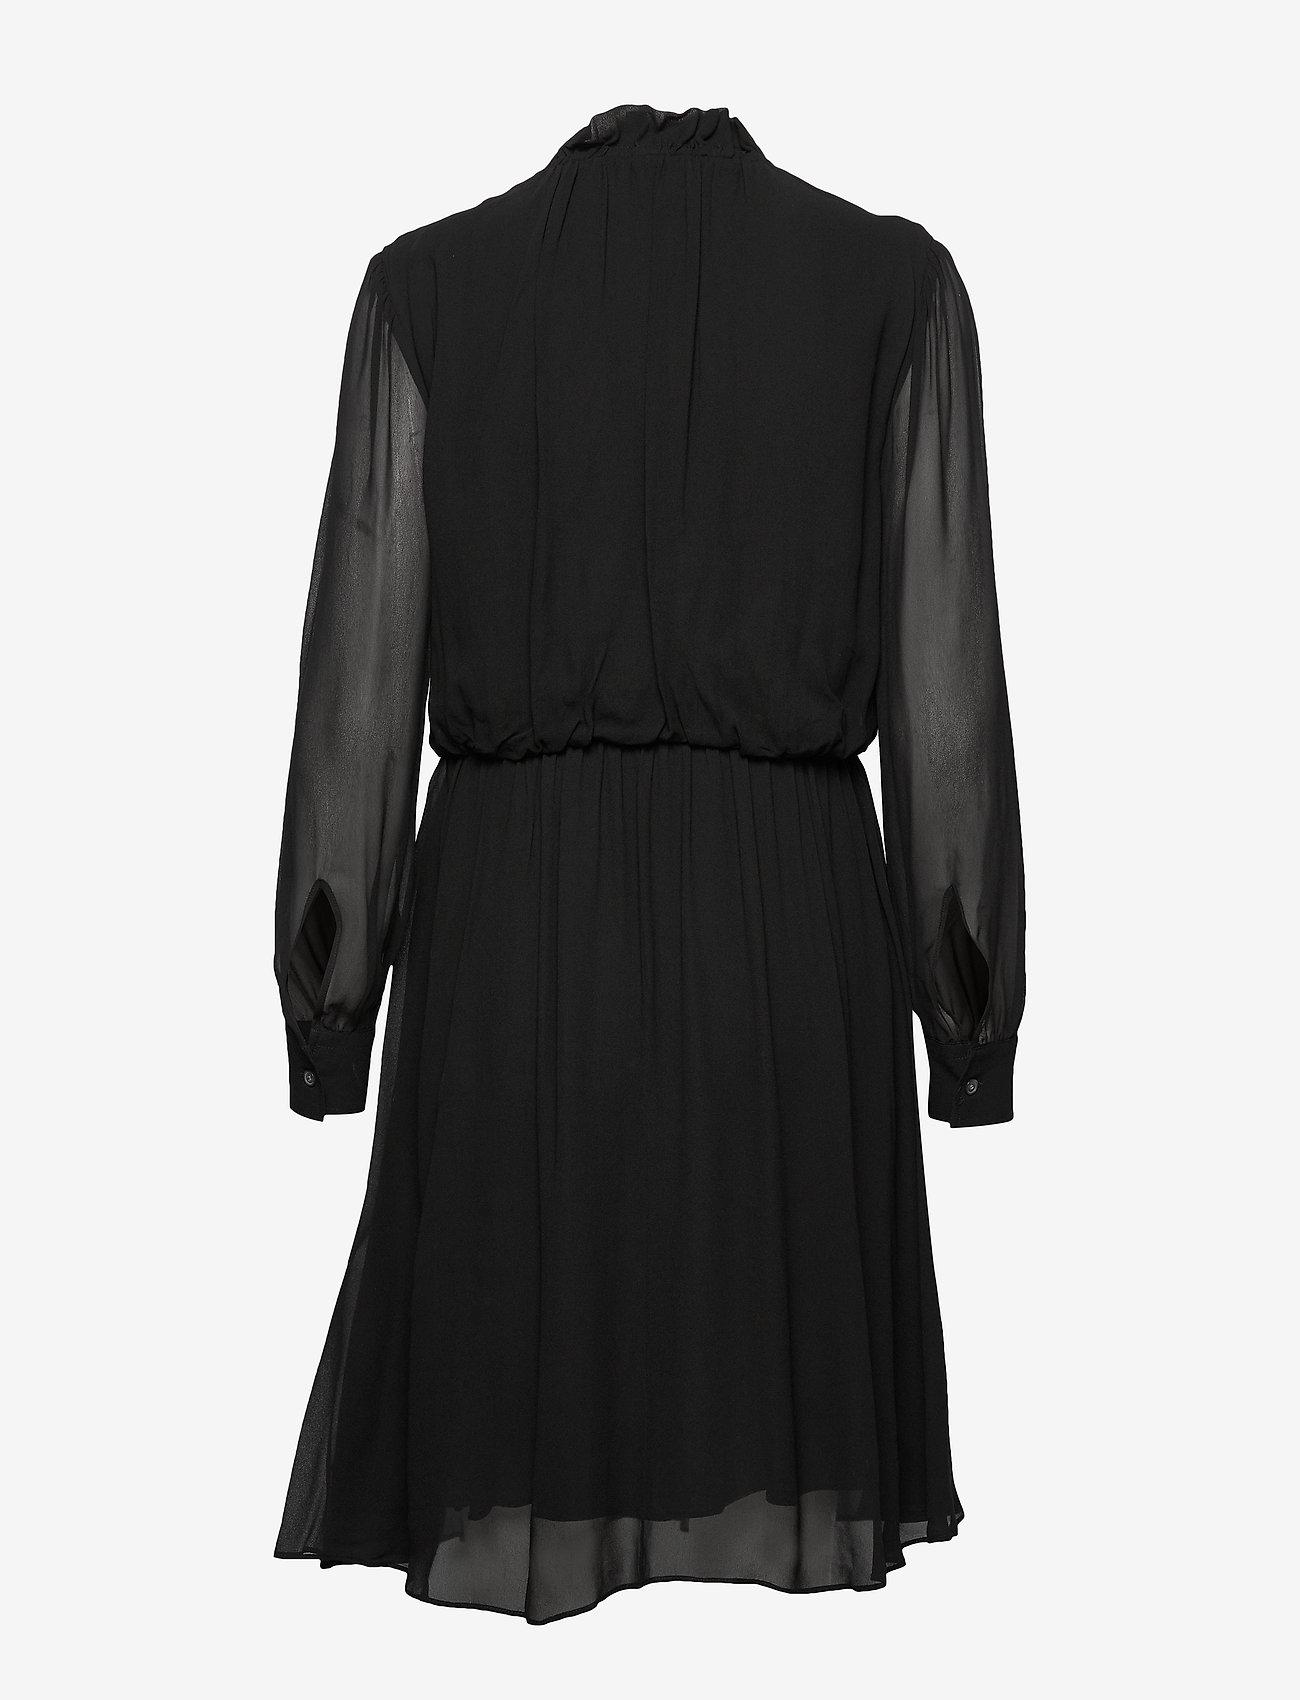 Georgette Ruffle Dress (Calvin Black) (1690 kr) - Calvin Klein